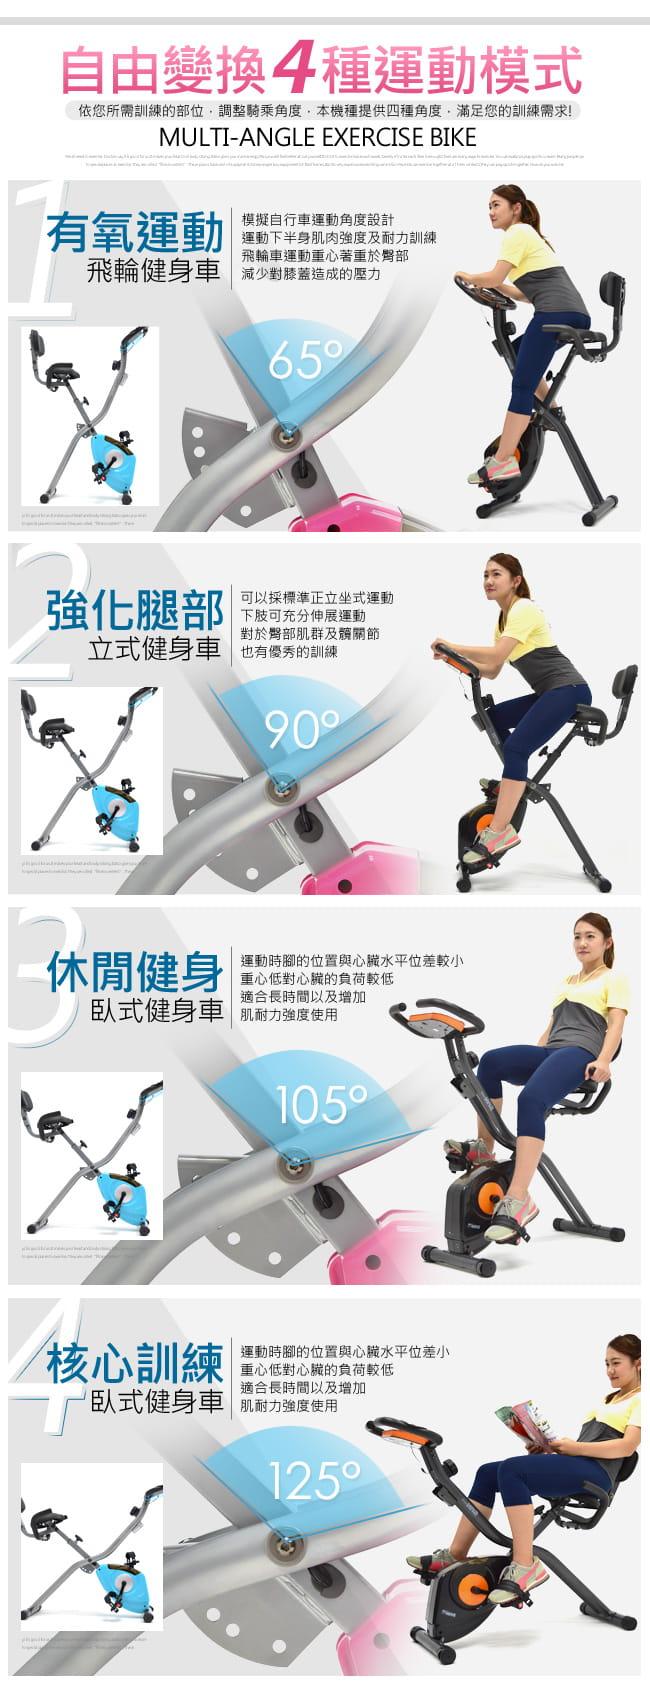 【SAN SPORTS】四角度飛輪式磁控健身車(超大座椅+椅背) 4